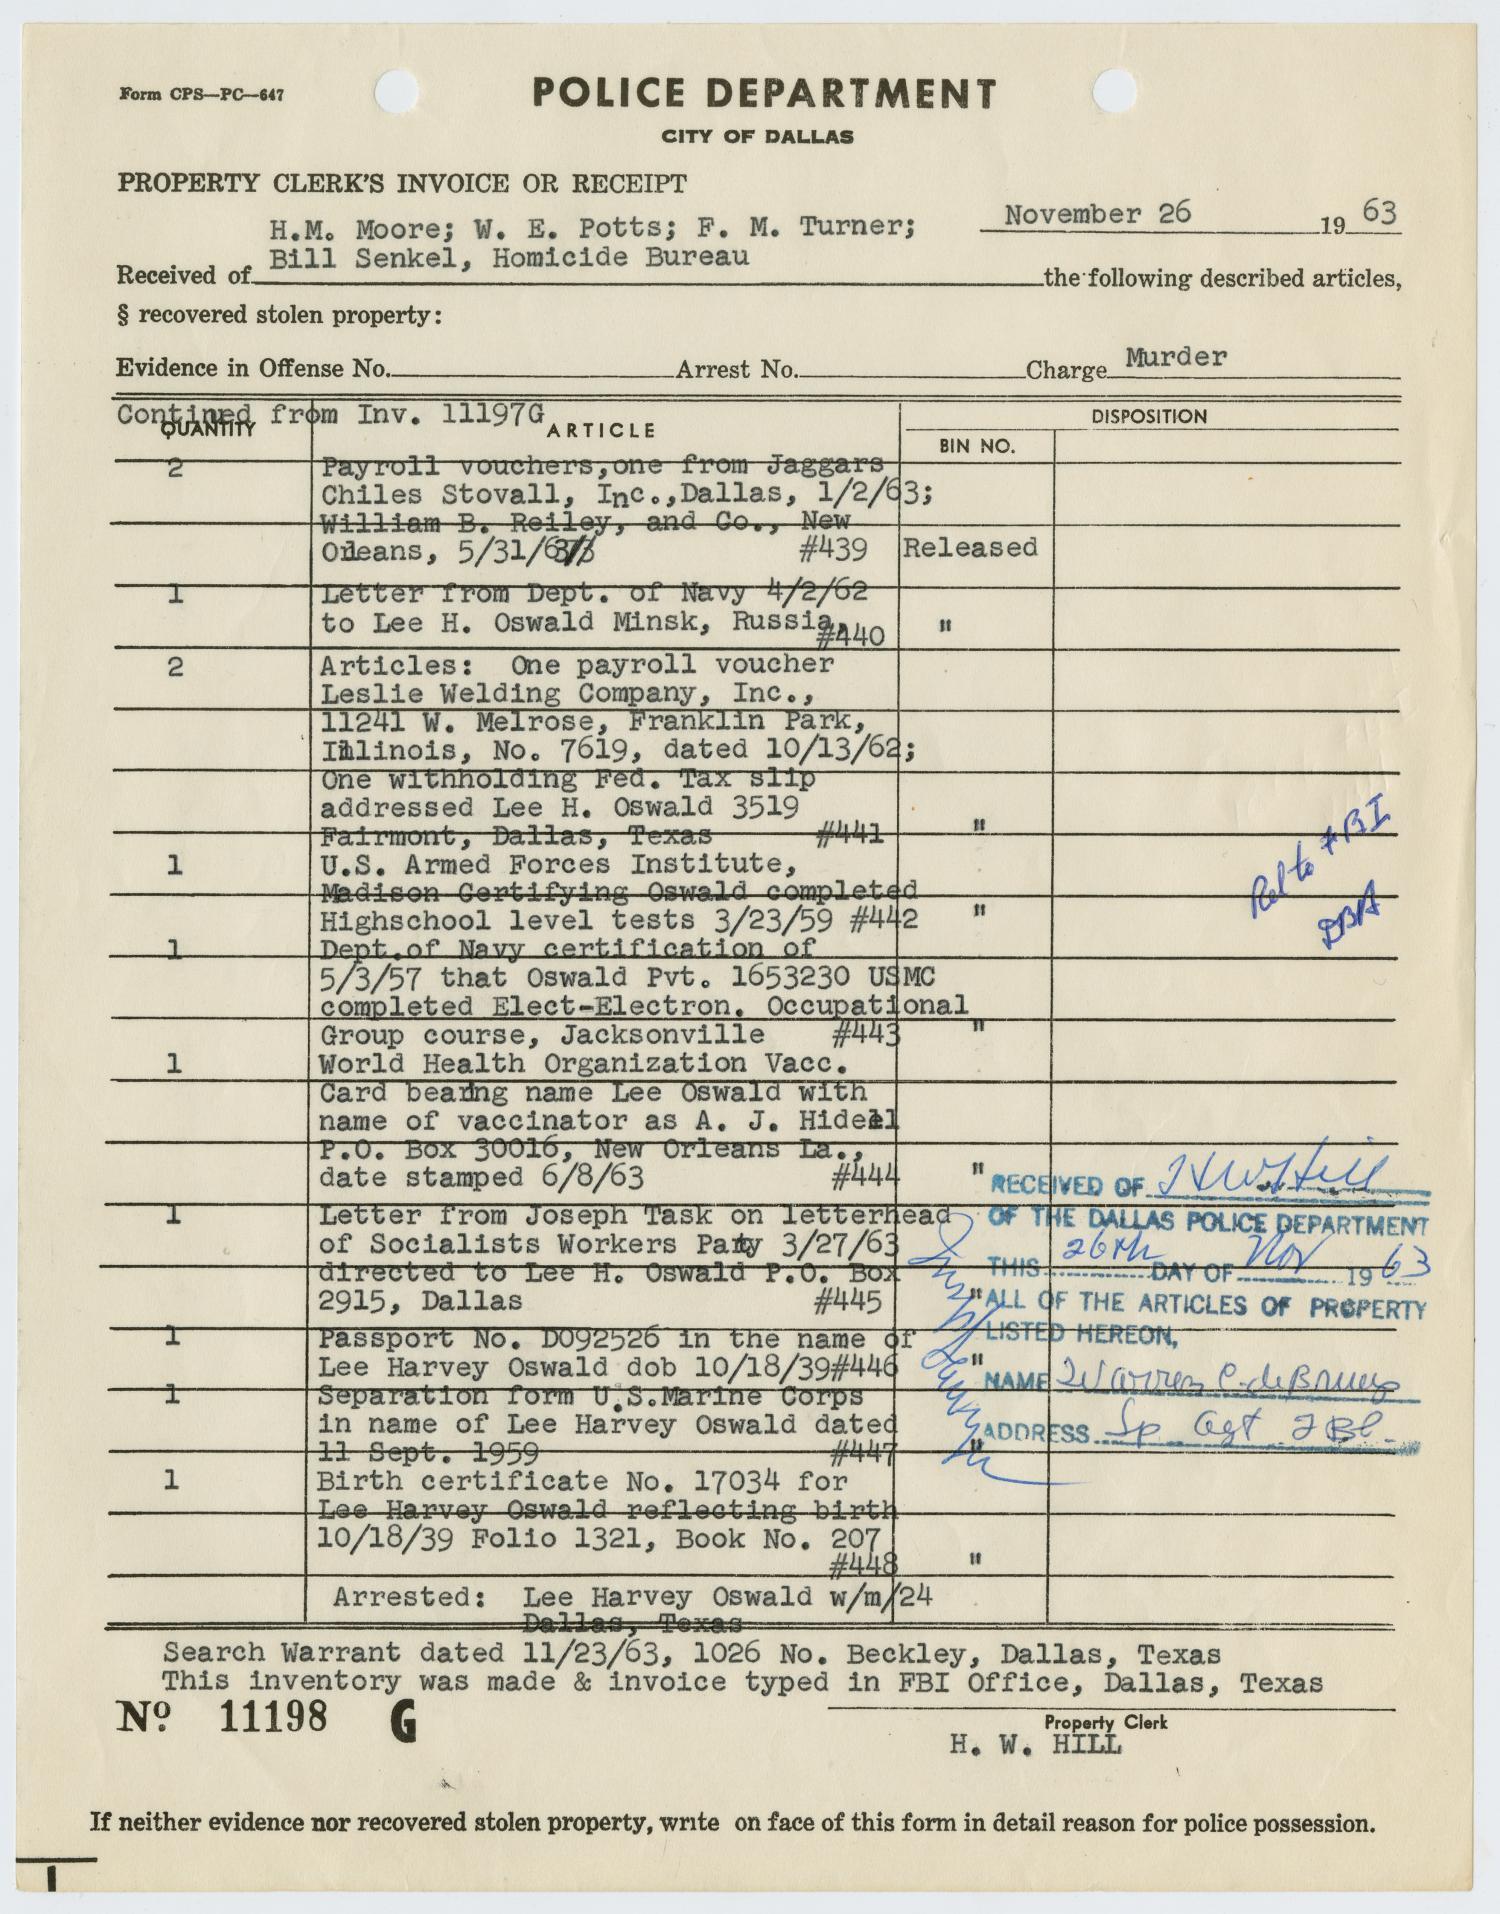 Property Clerks Receipt Of Lee Harvey Oswalds Belongings Page 9